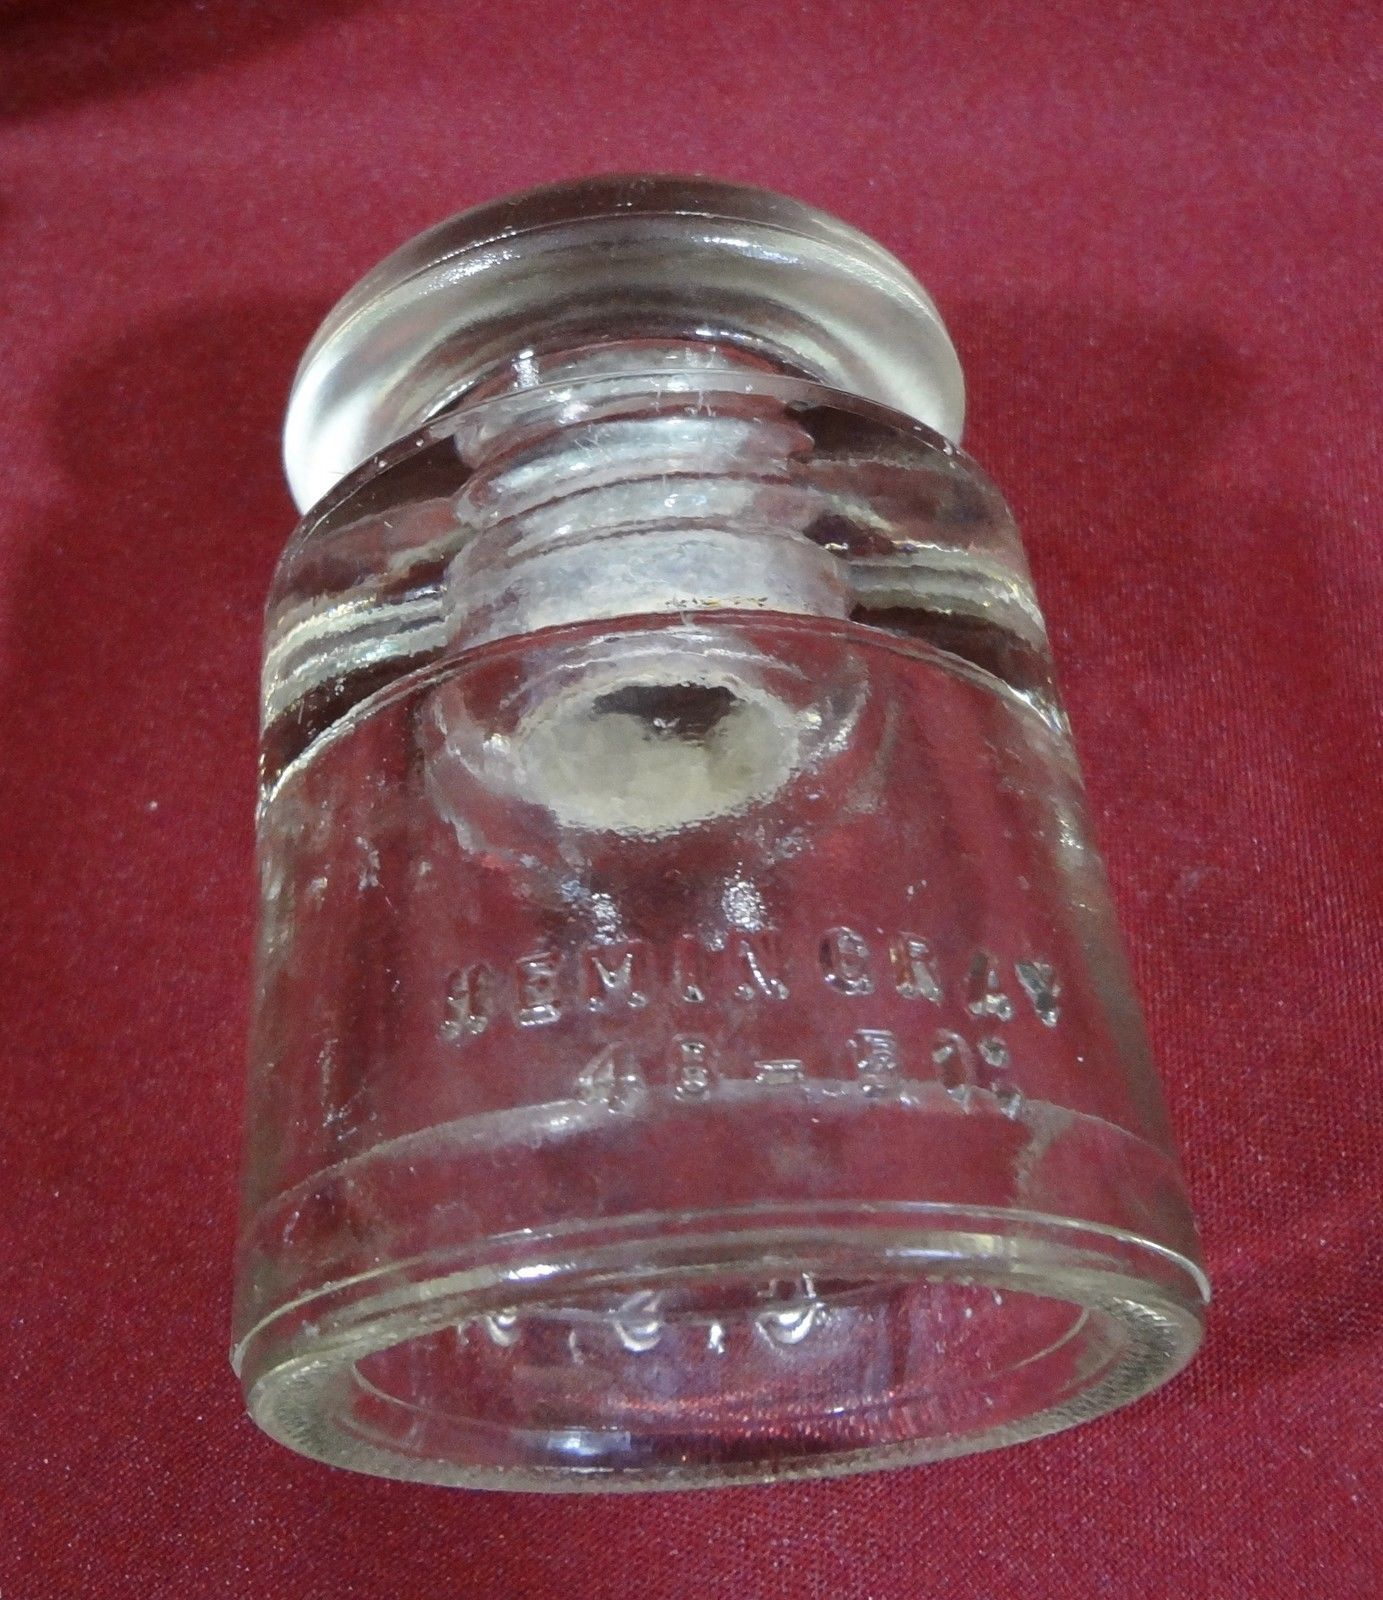 Hemingray 50 - 51 Glass Insulator Clear Telephone Electrical Power Pole Vintage